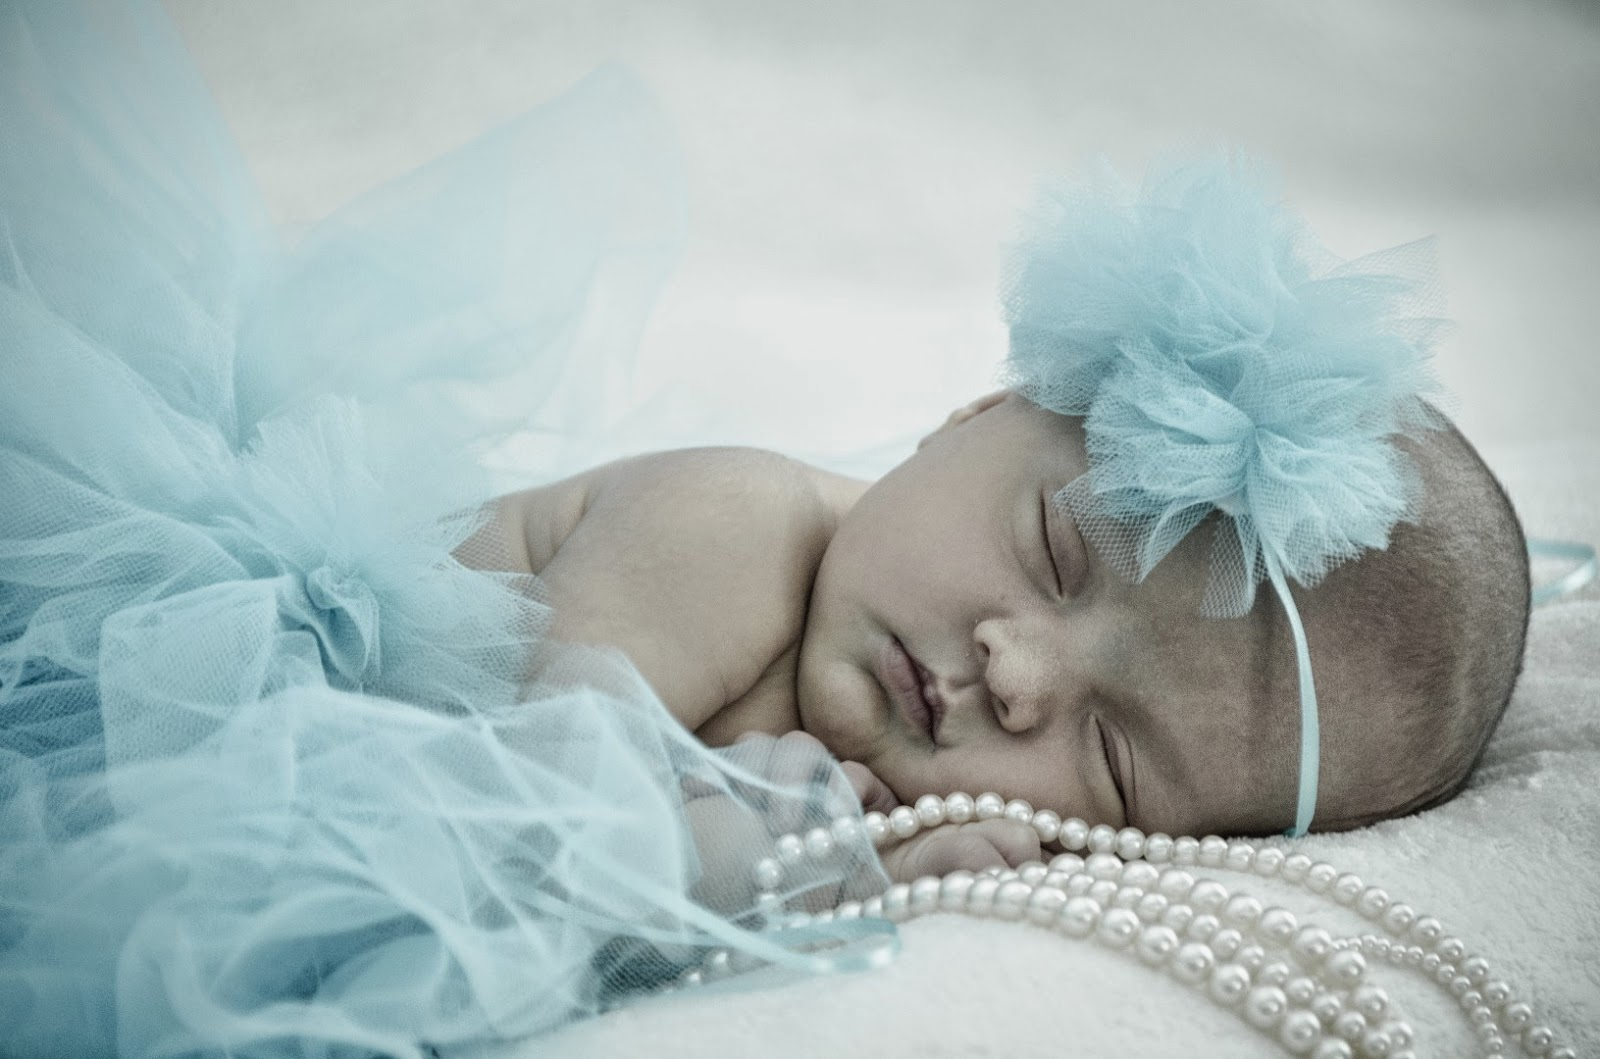 http://craftyc0rn3r.blogspot.com/2014/08/no-sew-baby-infant-tutu.html